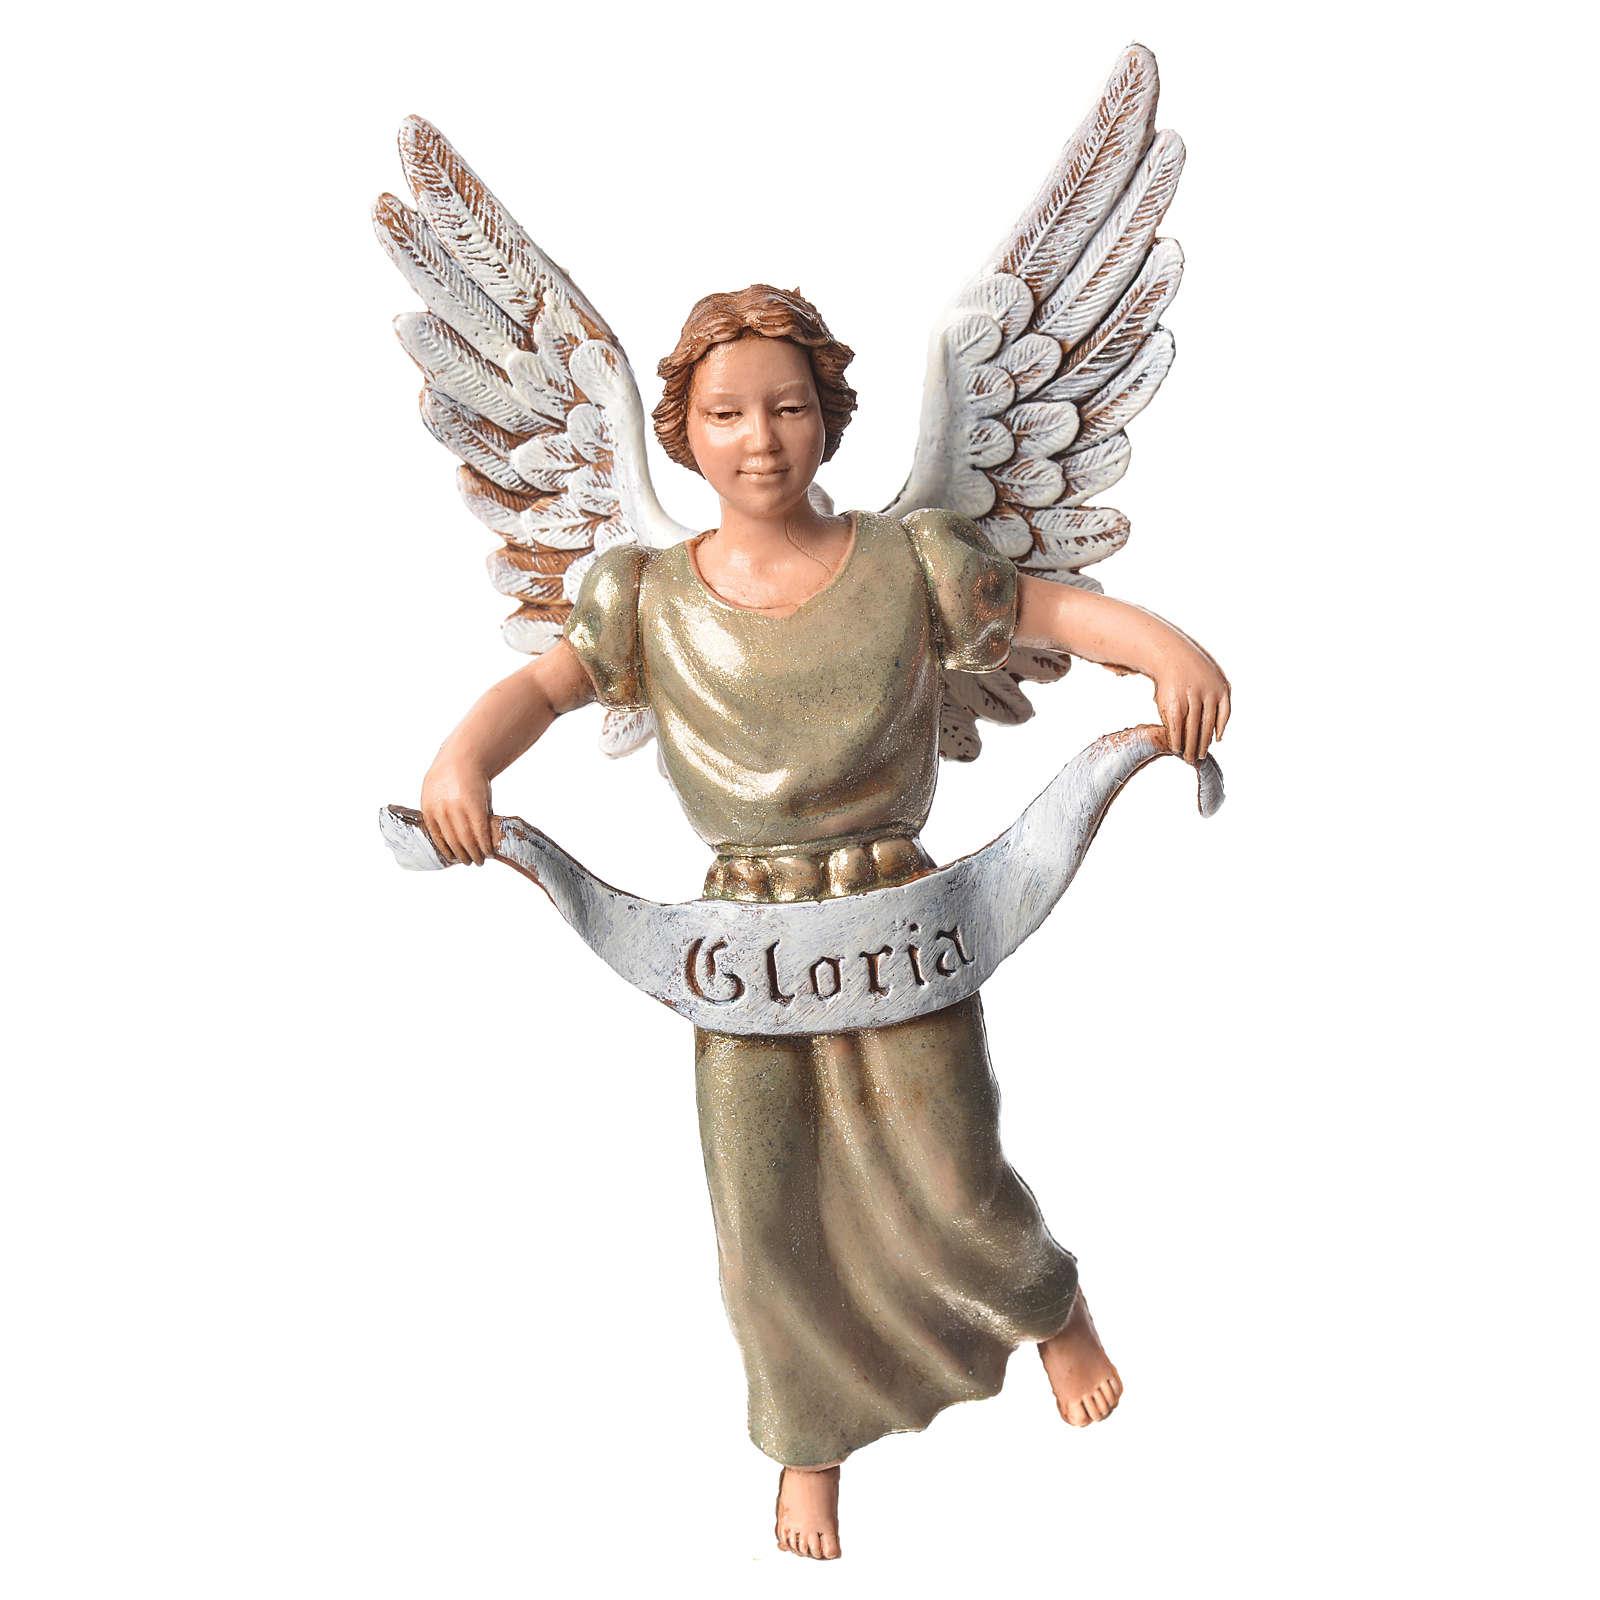 Nativité 12 cm 6 santons Moranduzzo 4